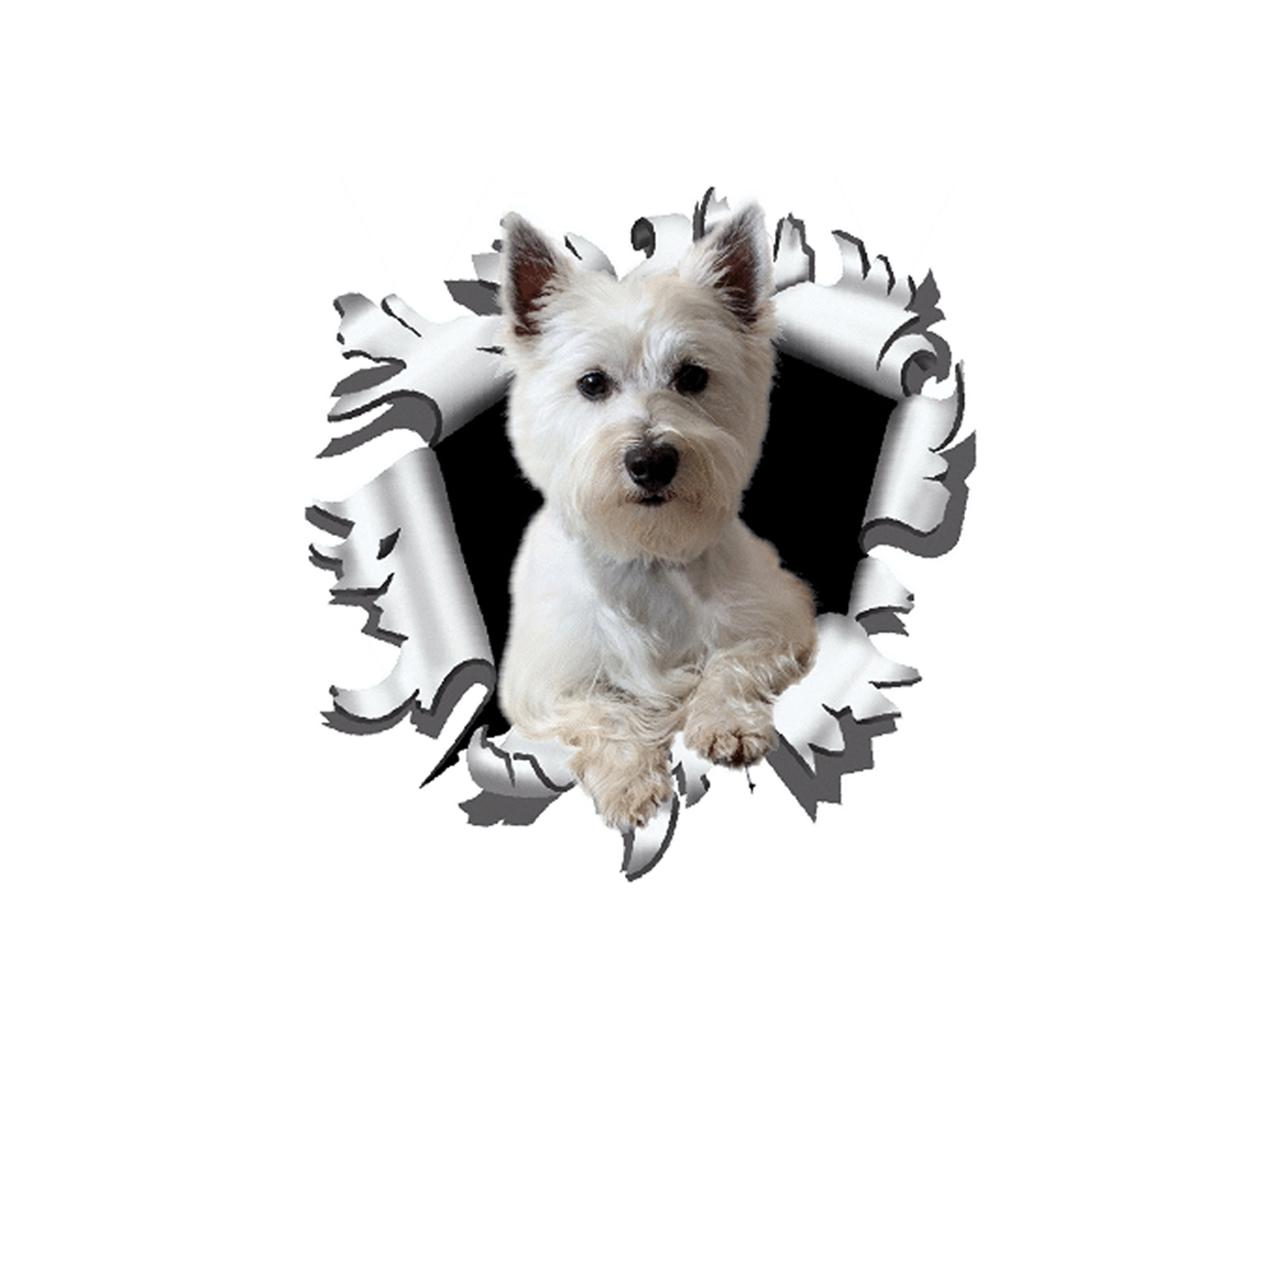 برچسب بدنه خودرو طرح سگ  کد D3